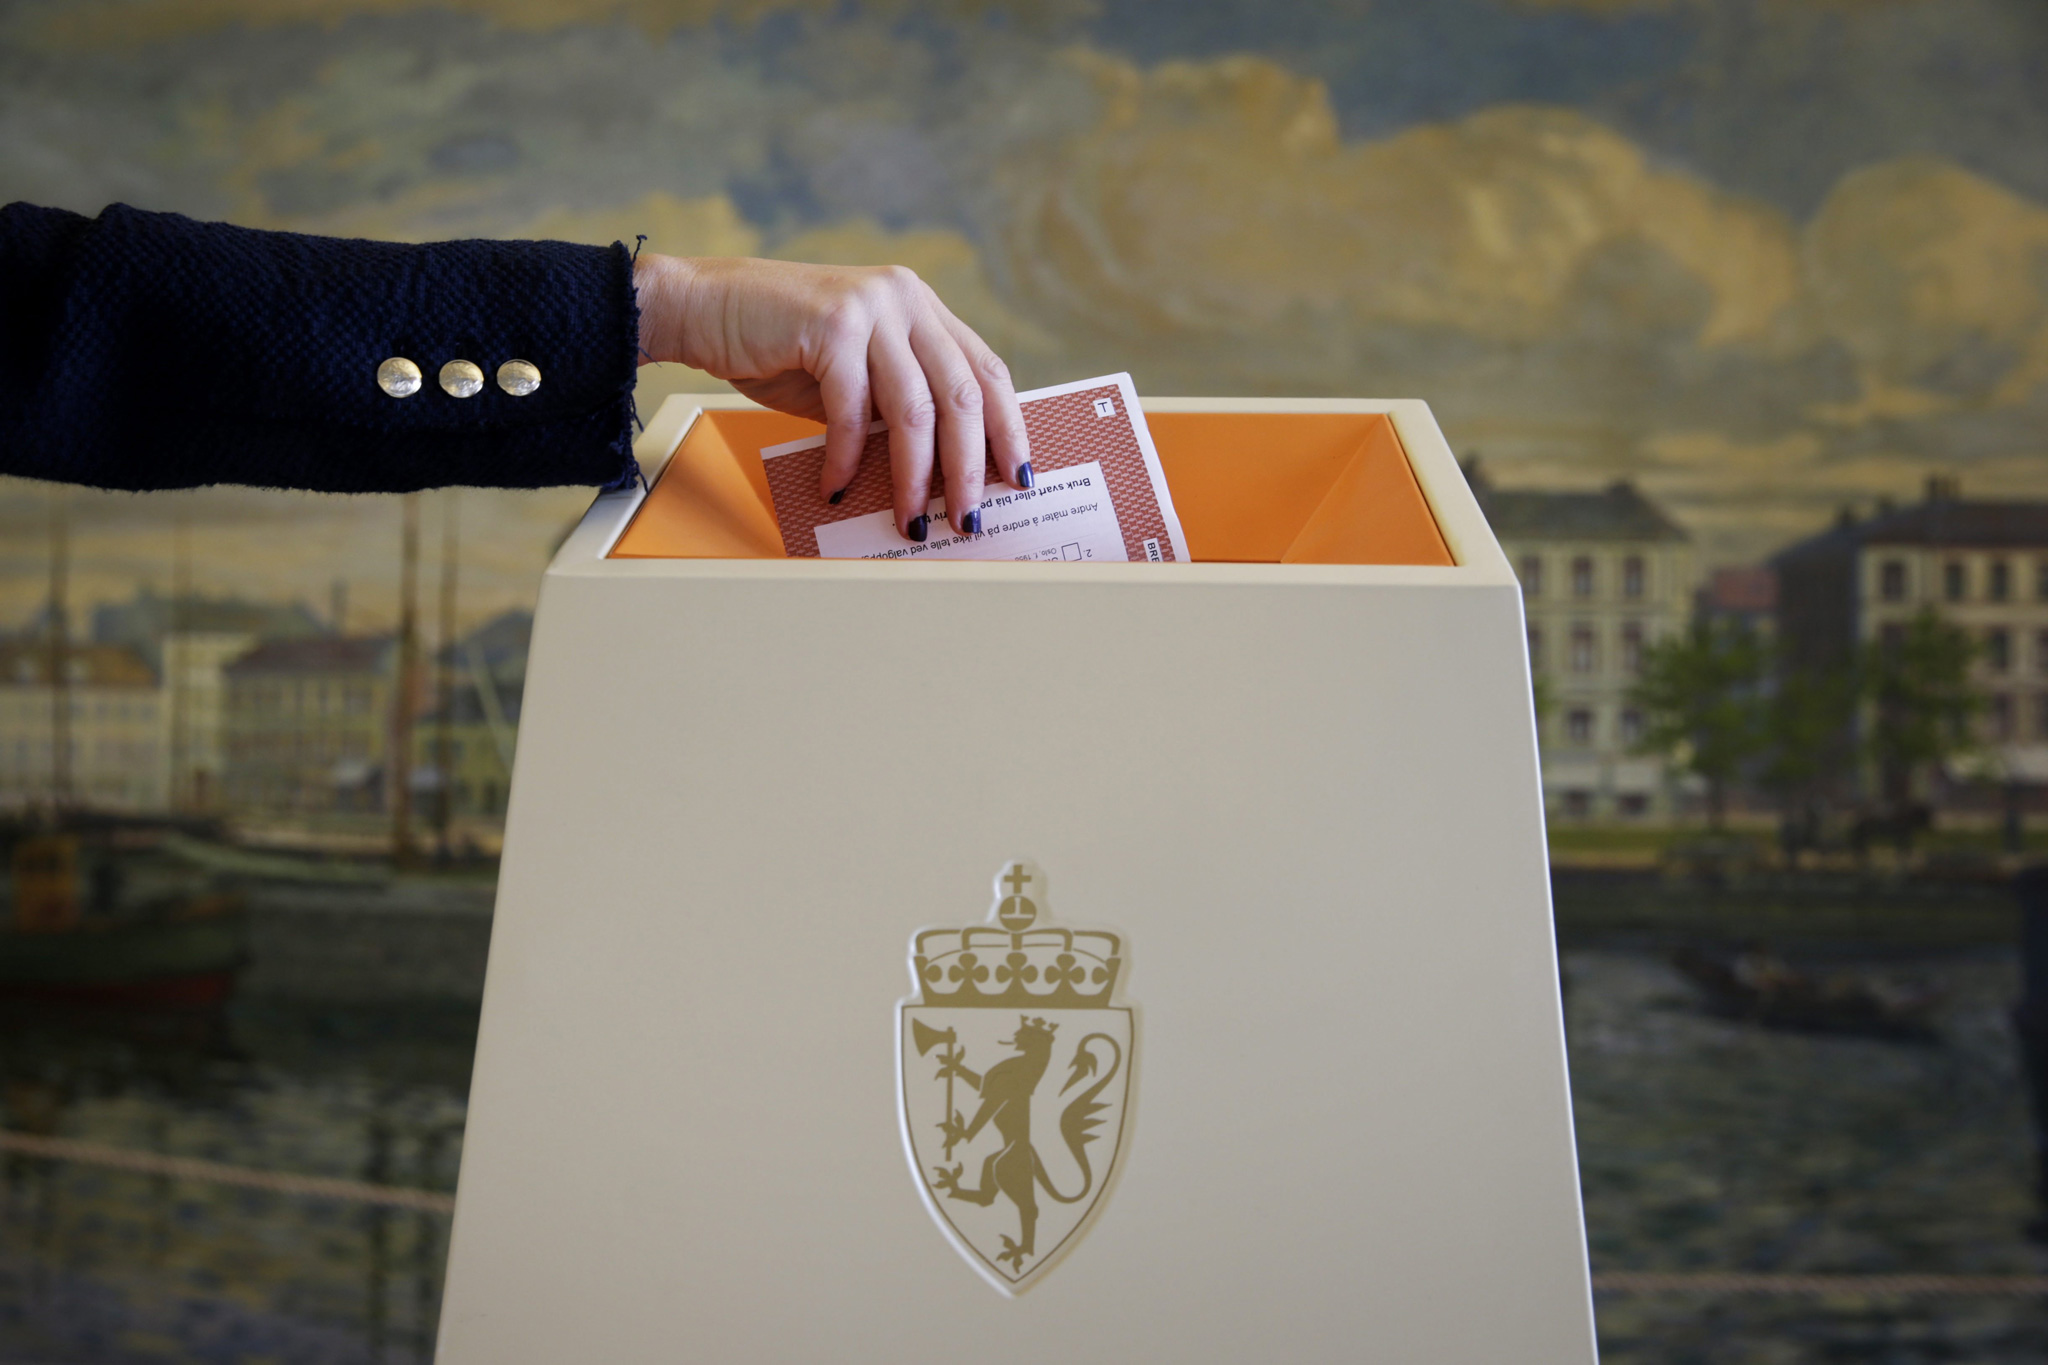 Illustrasjonsfoto: Håkon Mosvold Larsen / NTB scanpix / NPK